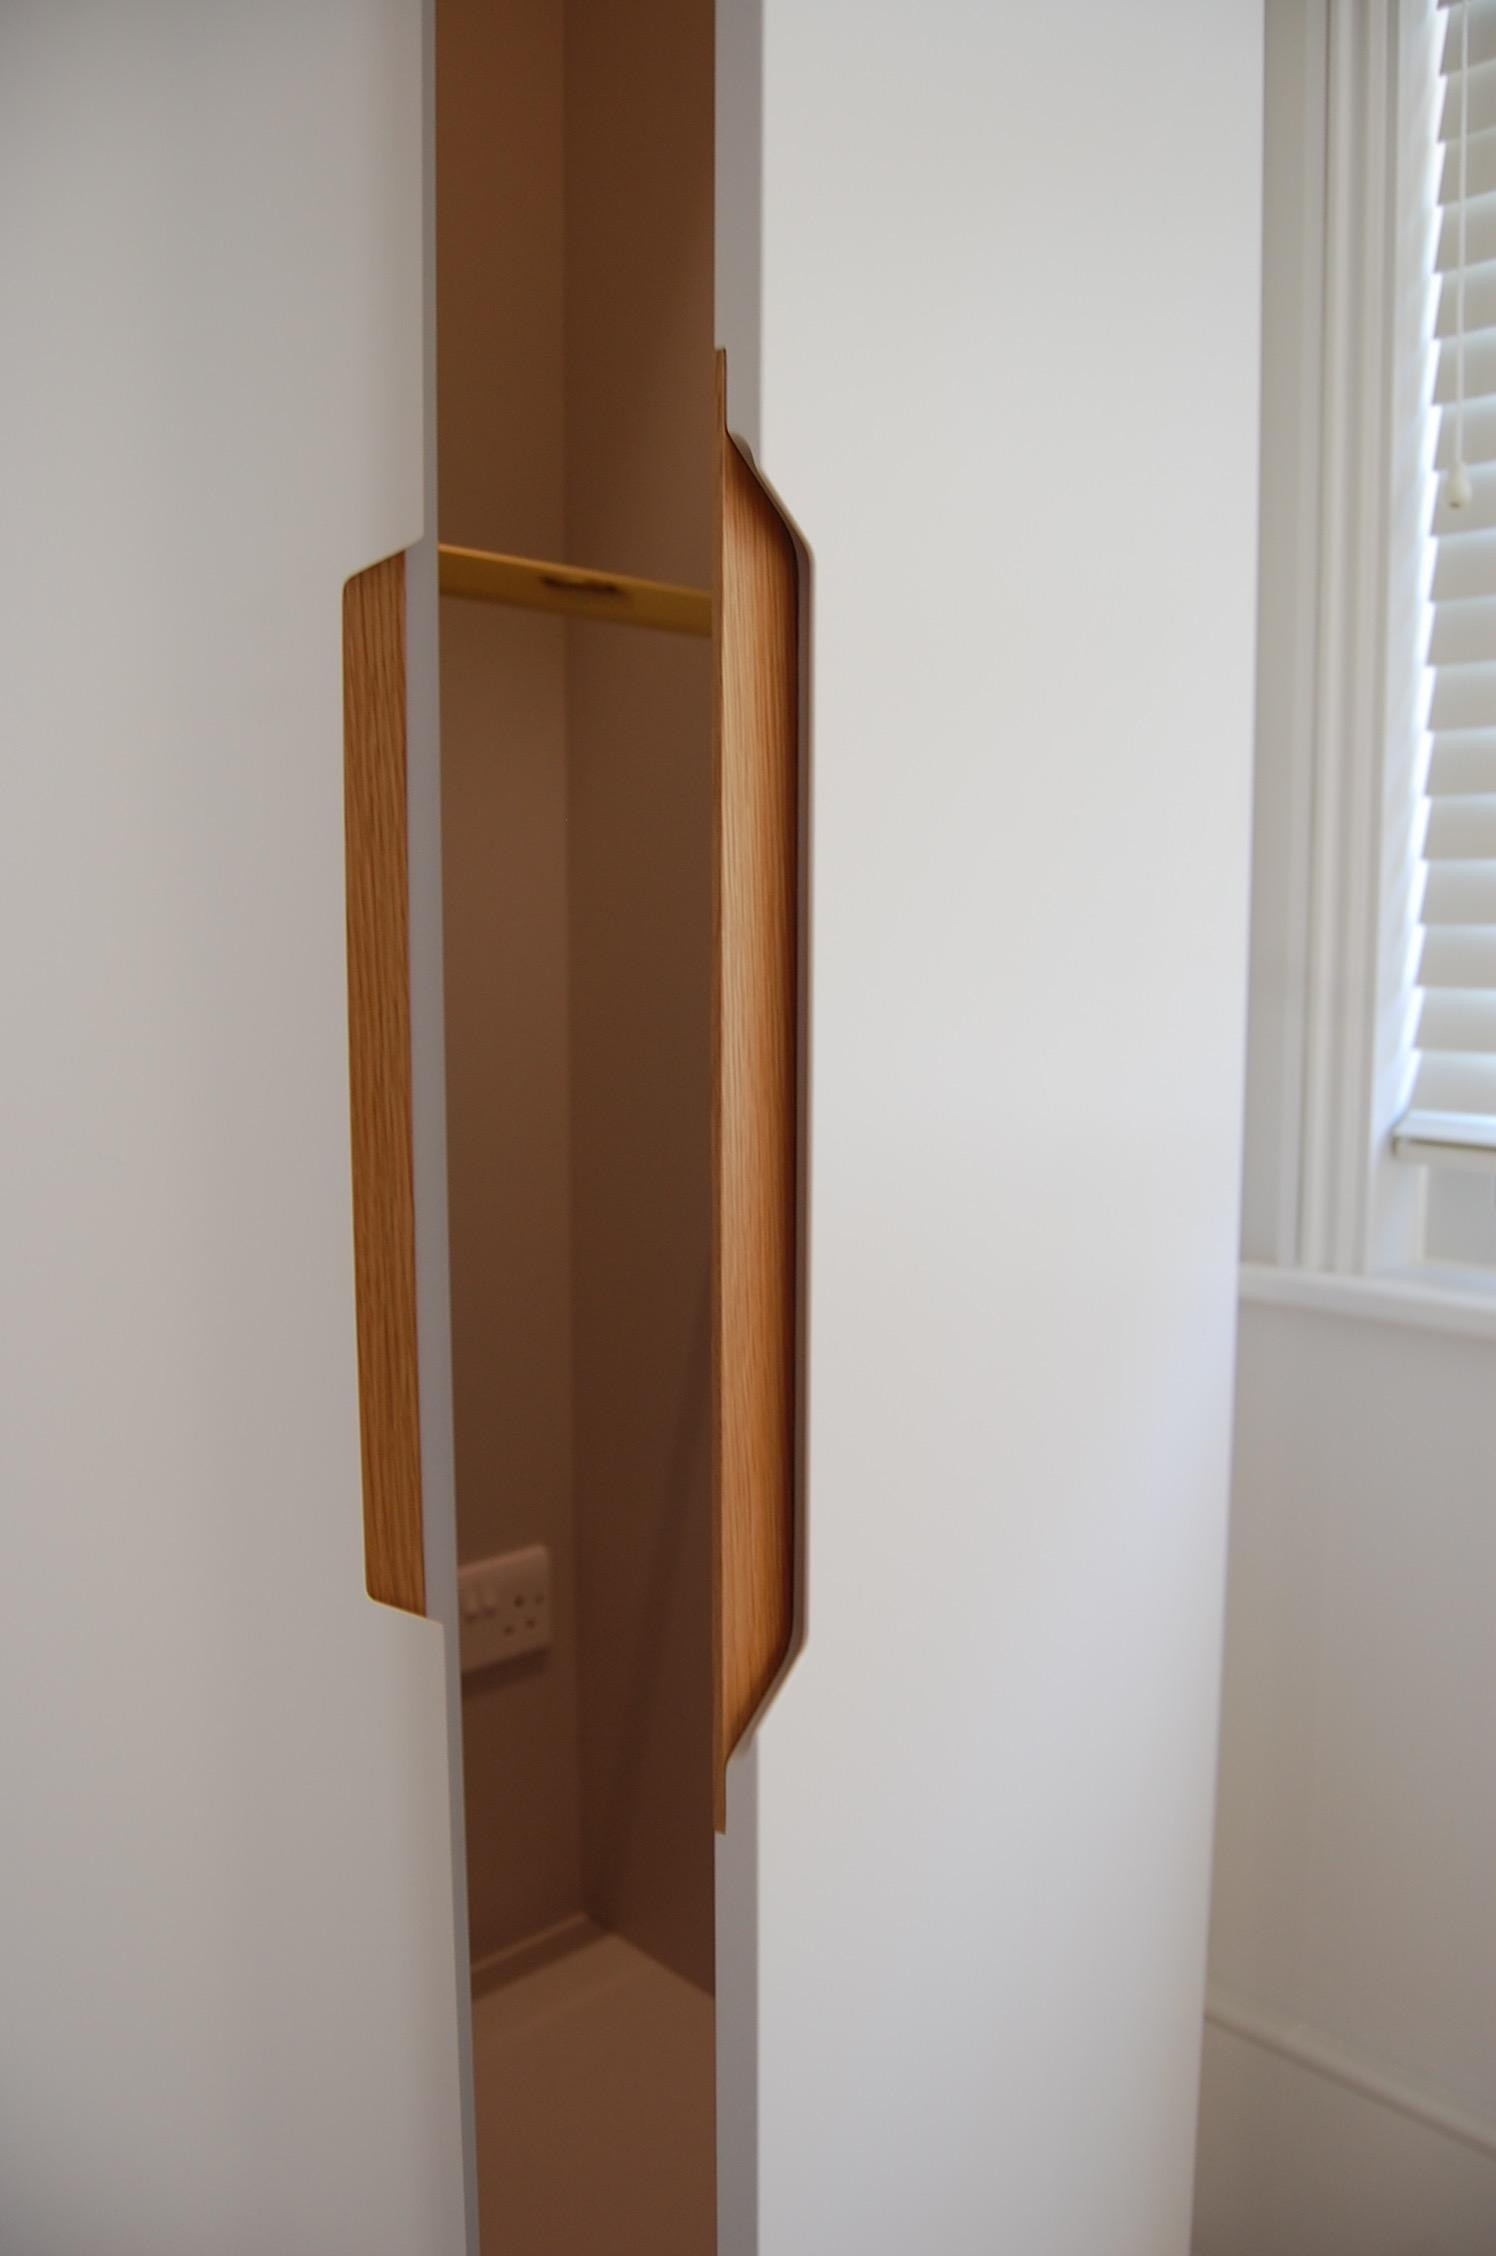 Grain_Bespoke_Furniture_Chelsea_Wardrobe_2.jpg